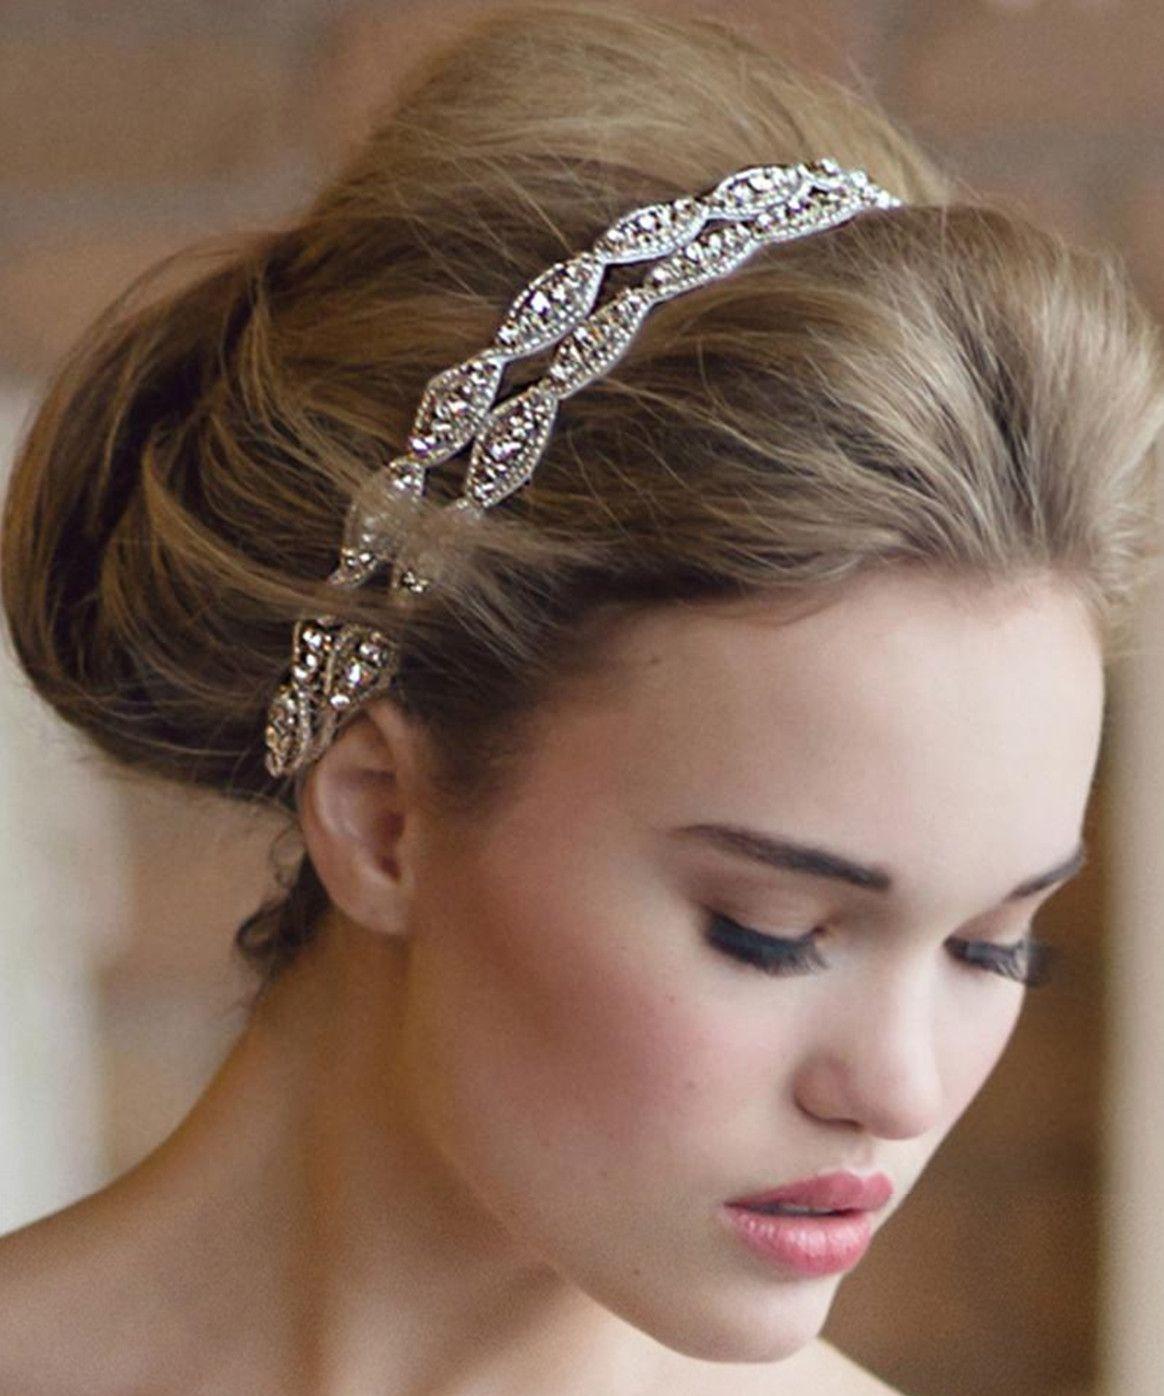 New Arrival Handmade Rhinestone Bridal Headbands Two Row Crystal ... ef510145e7e